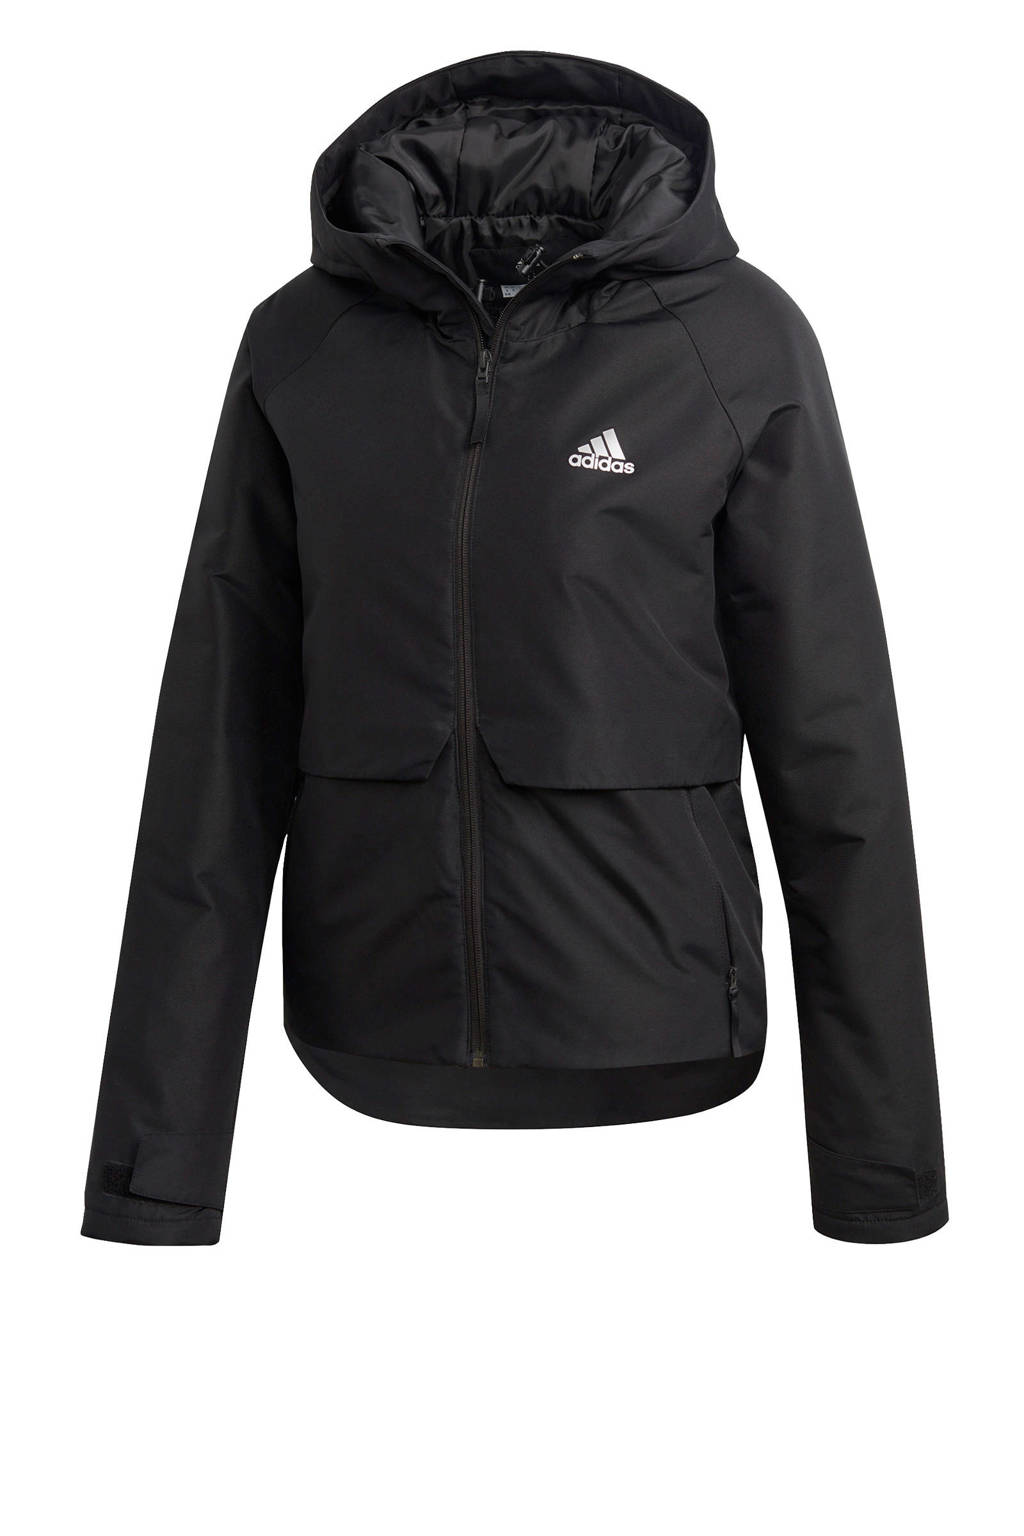 adidas Performance sportjack zwart, Zwart